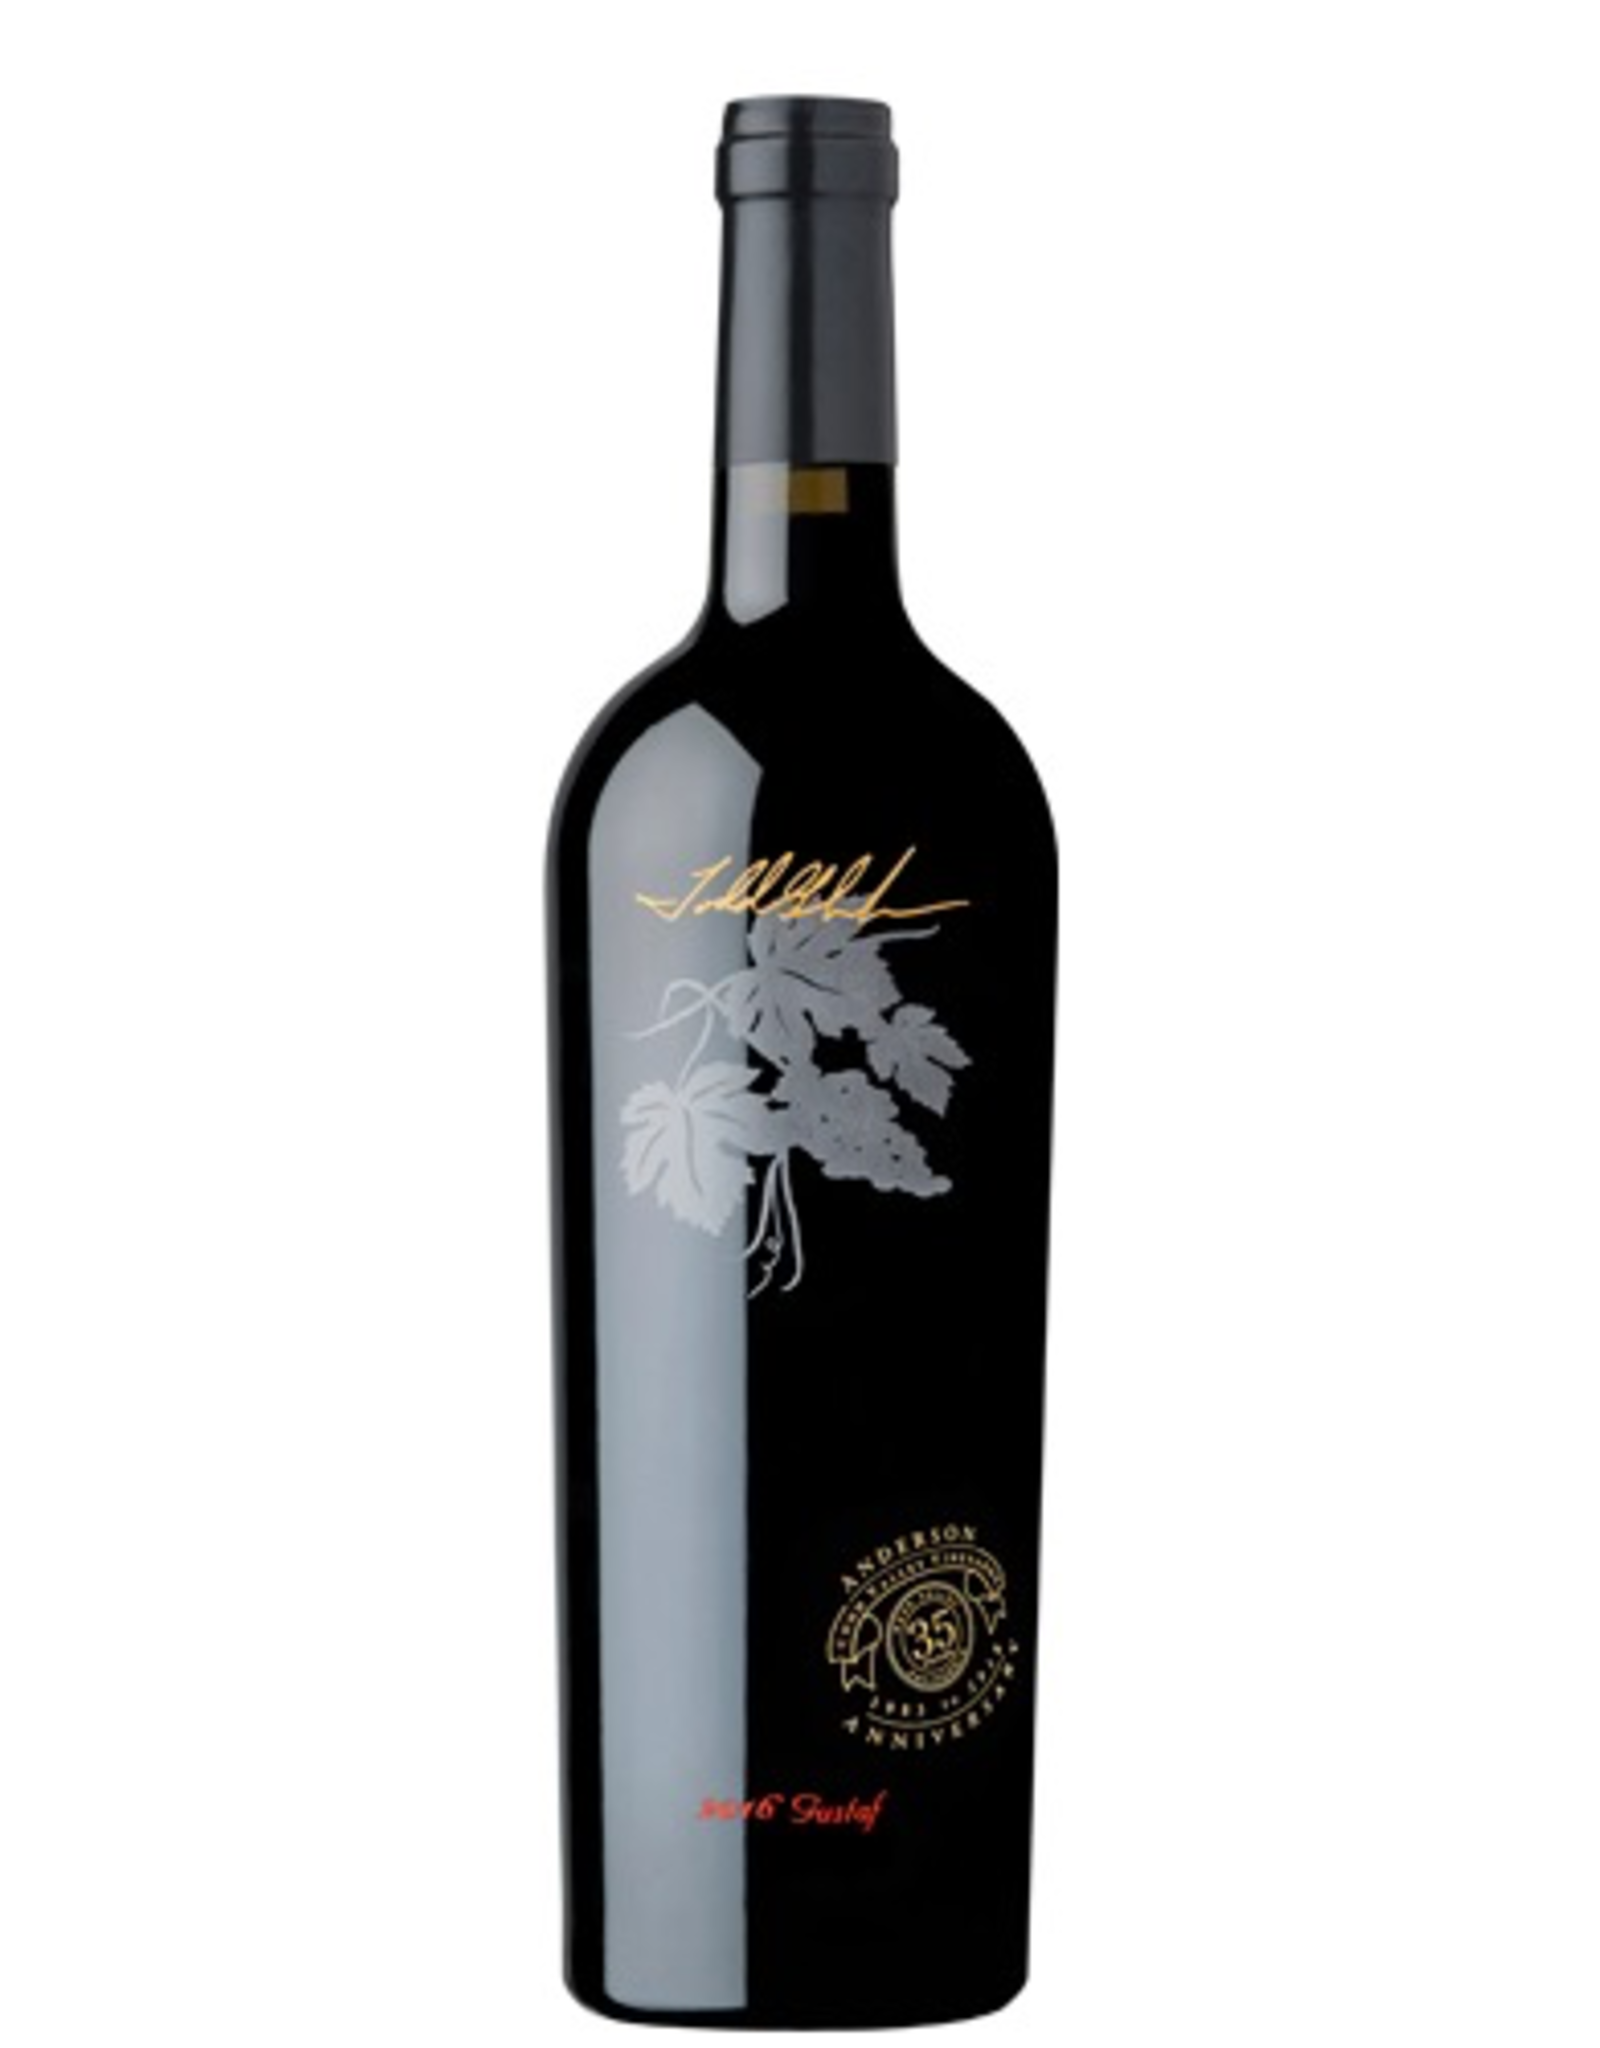 Red Wine 2016, Conn Valley GUSTAF, Cabernet Franc, Saint Helena, Napa Valley, California, 14.7% Alc, CTnr